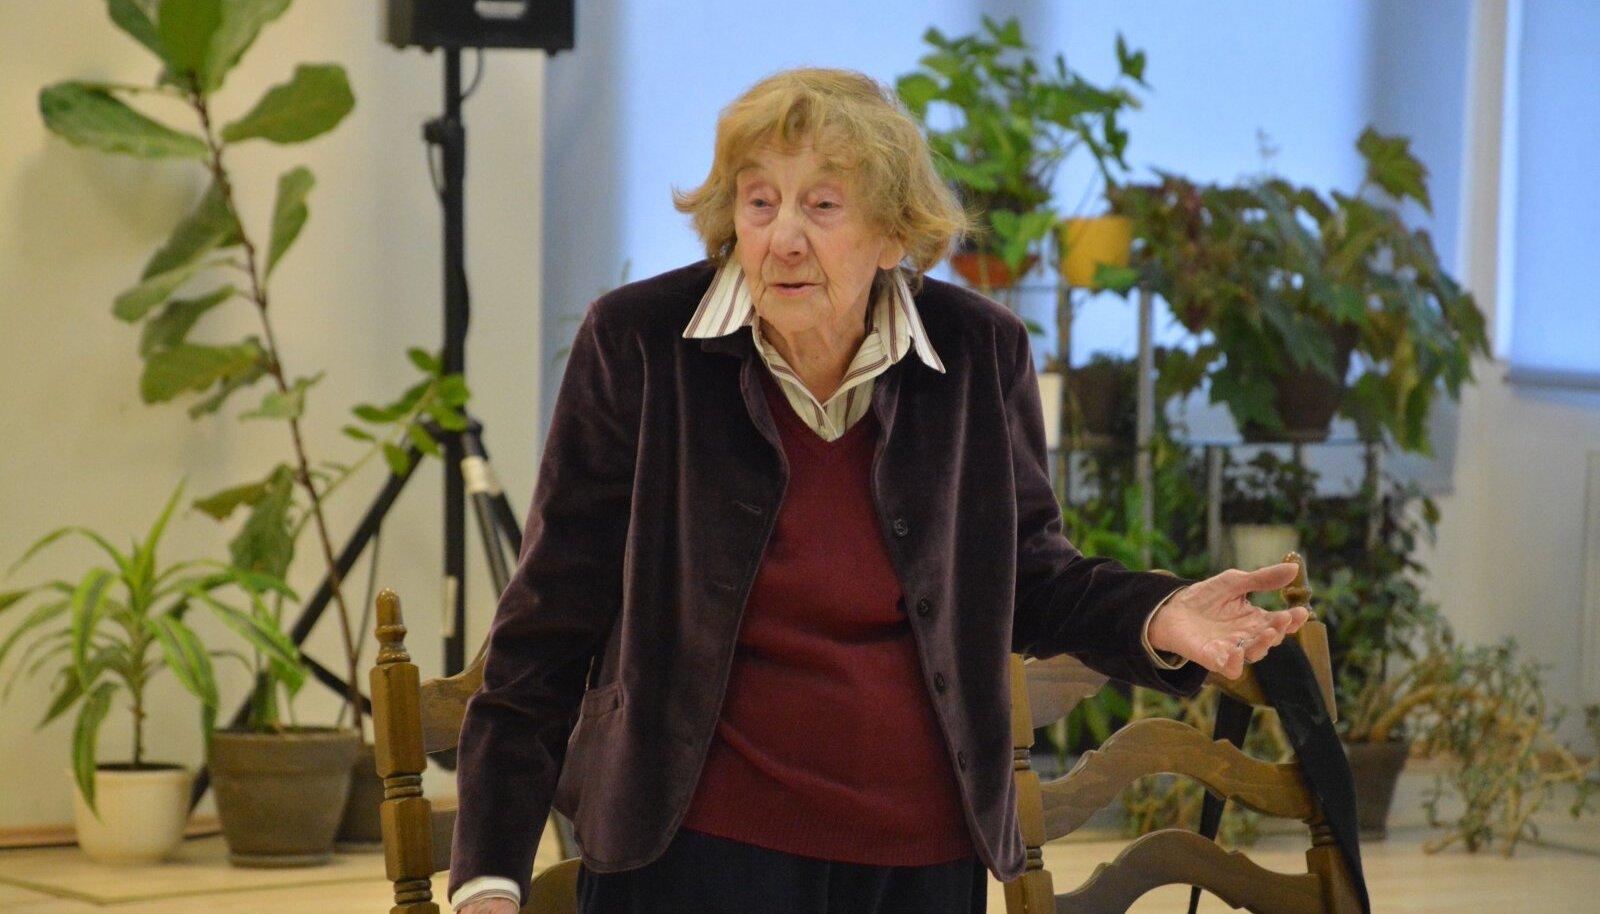 Leida Rammo (18.04 1924 - 23.07.2020)